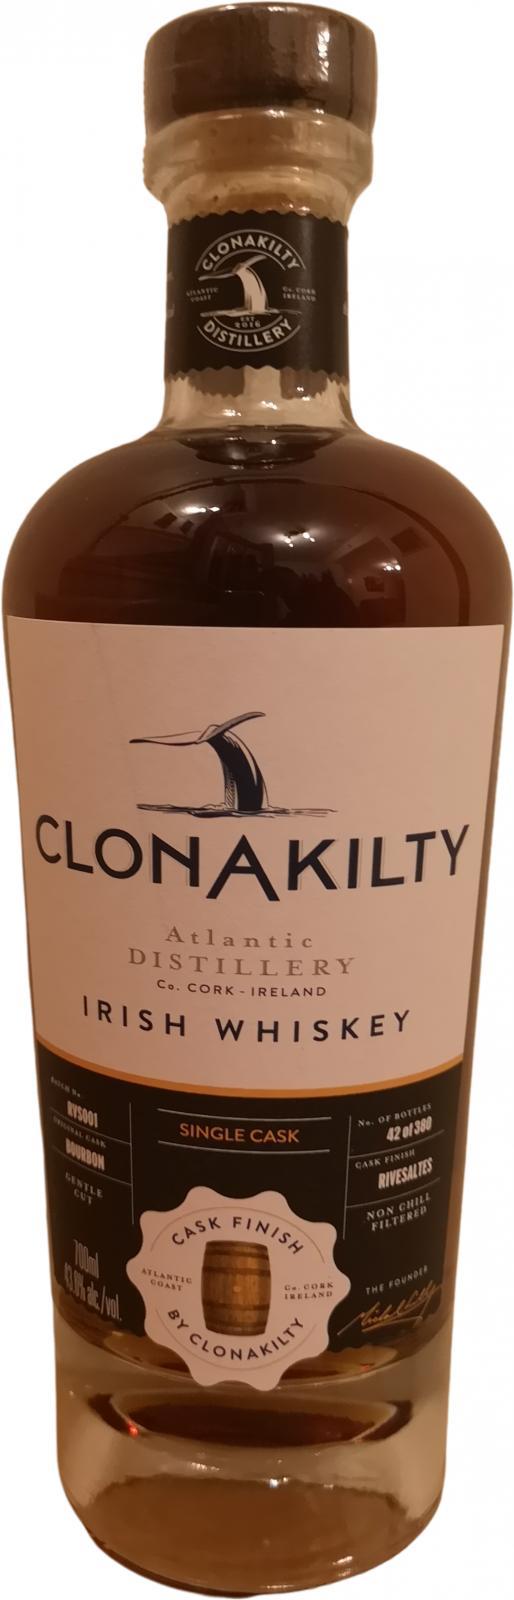 Clonakilty Rivesaltes Cask